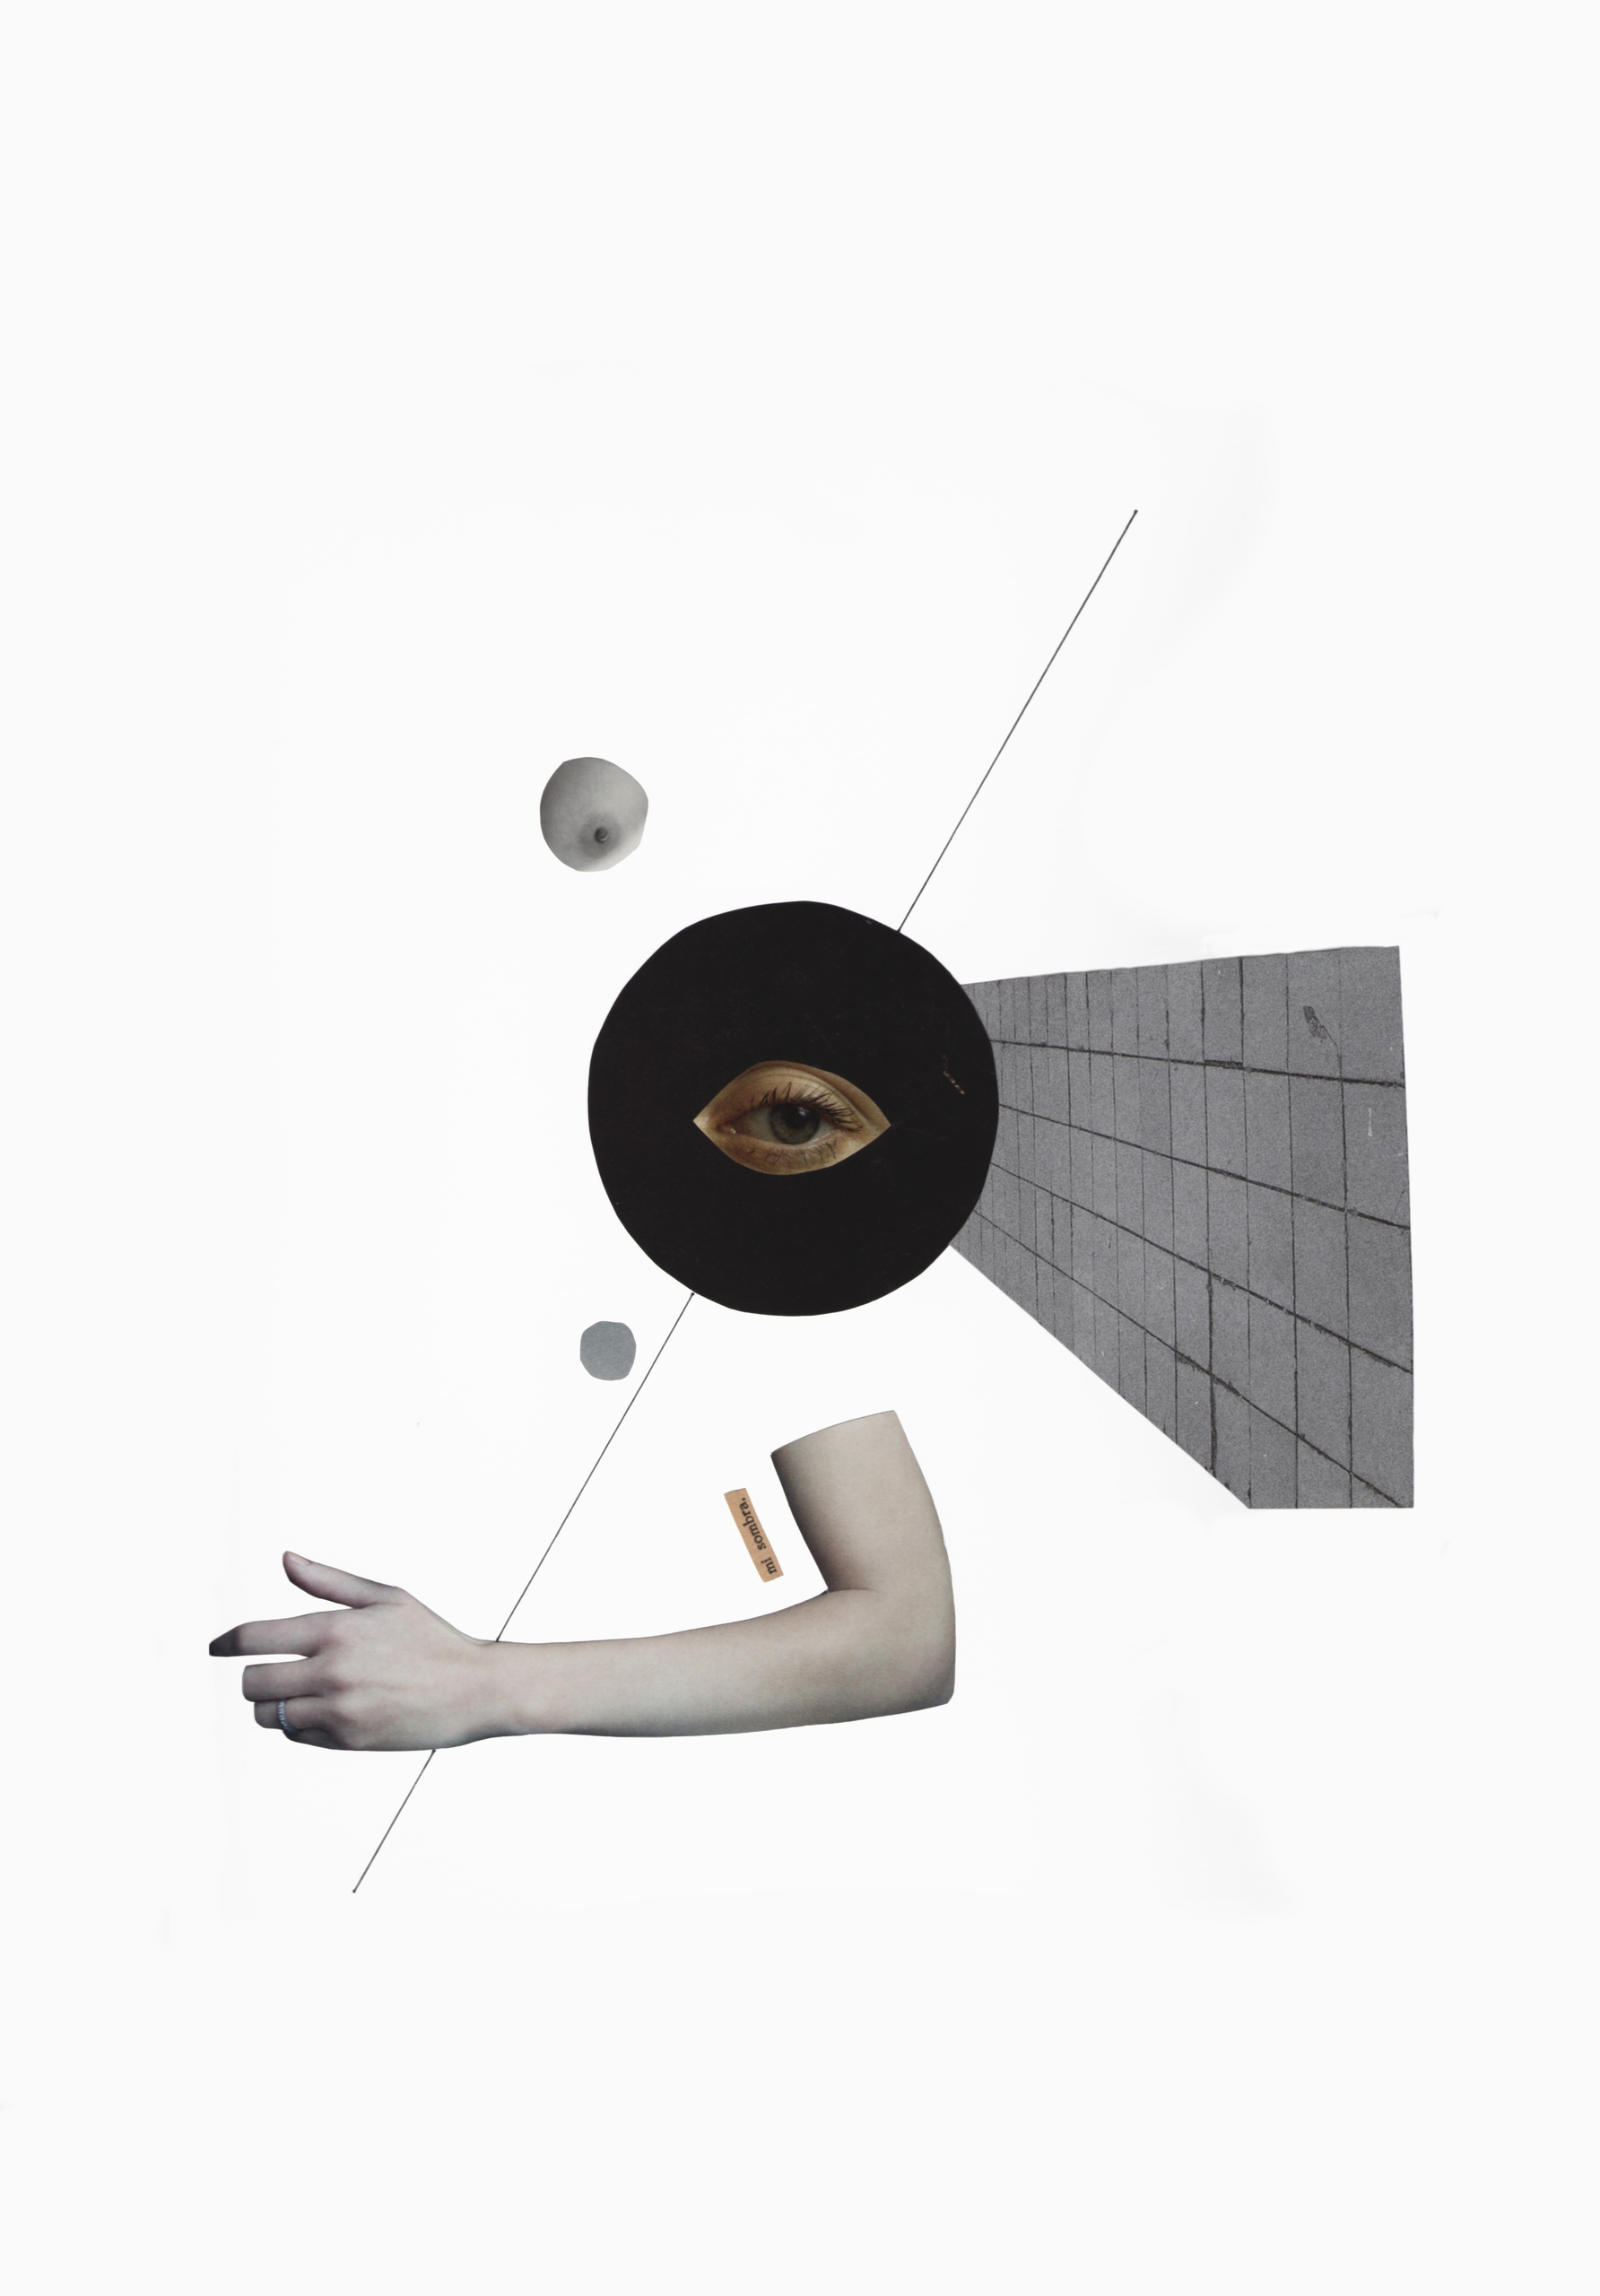 mi sombra collage - paper, artwork - marianagv | ello